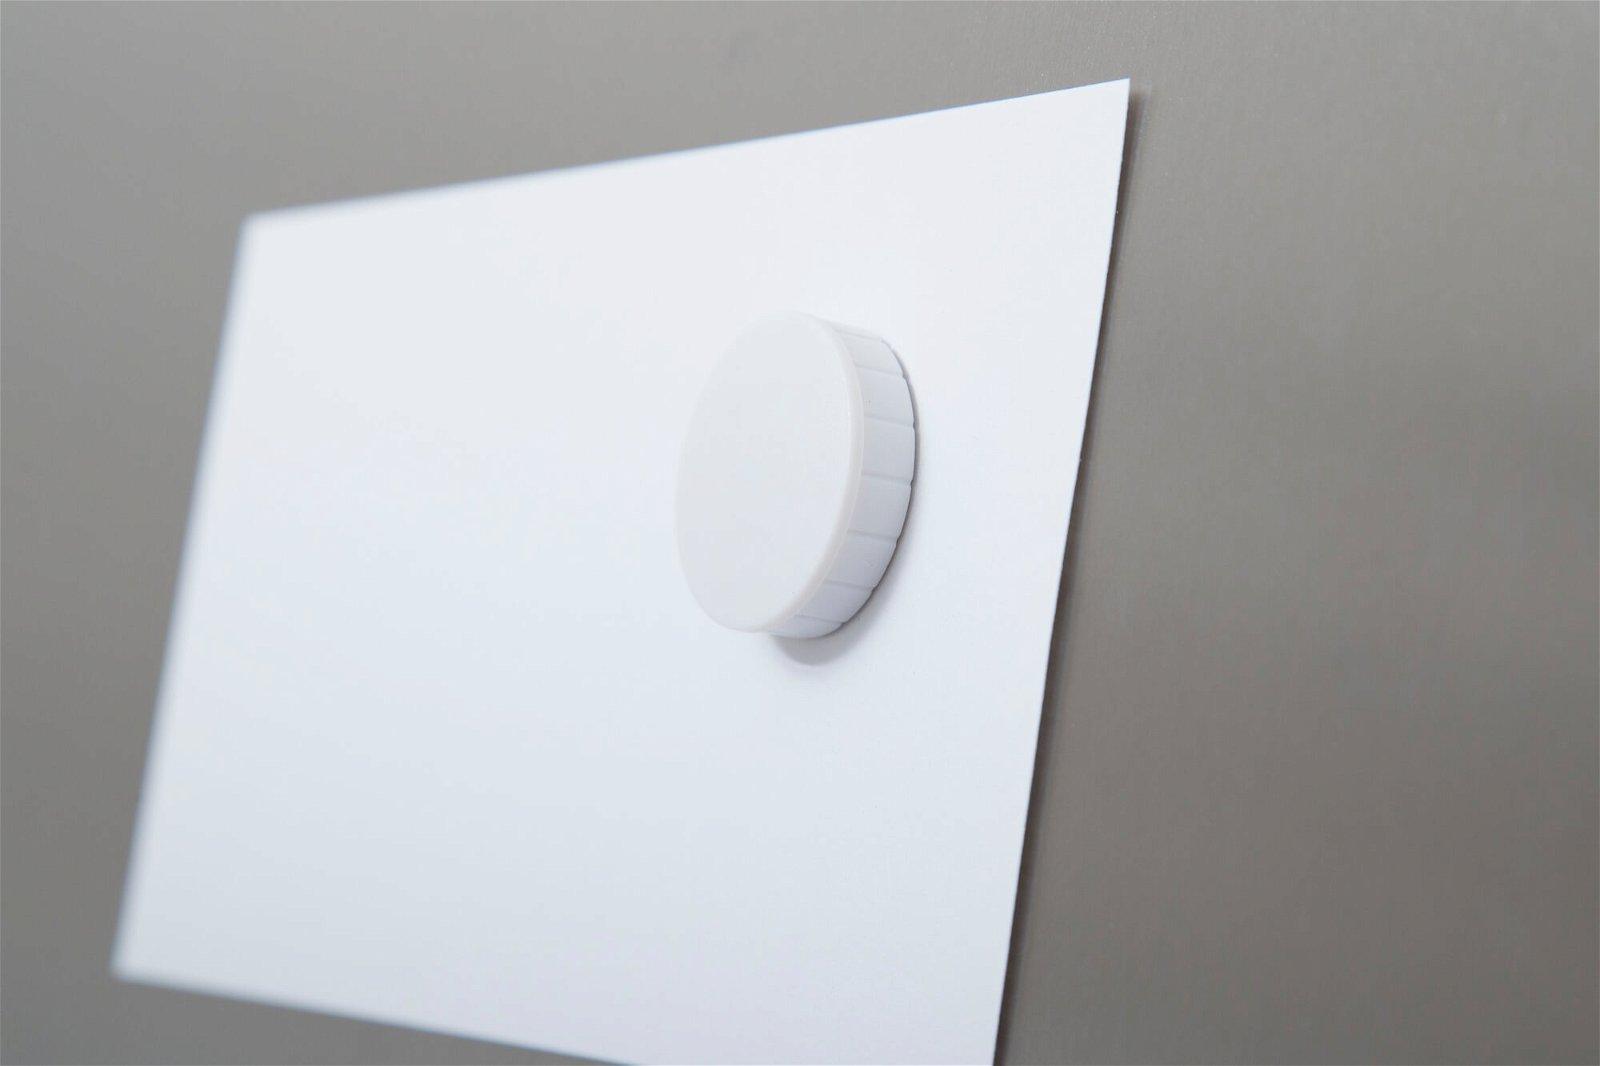 Magnet MAULsolid Ø 32 mm, 0,8 kg Haftkraft, 10 St./Ktn., weiß